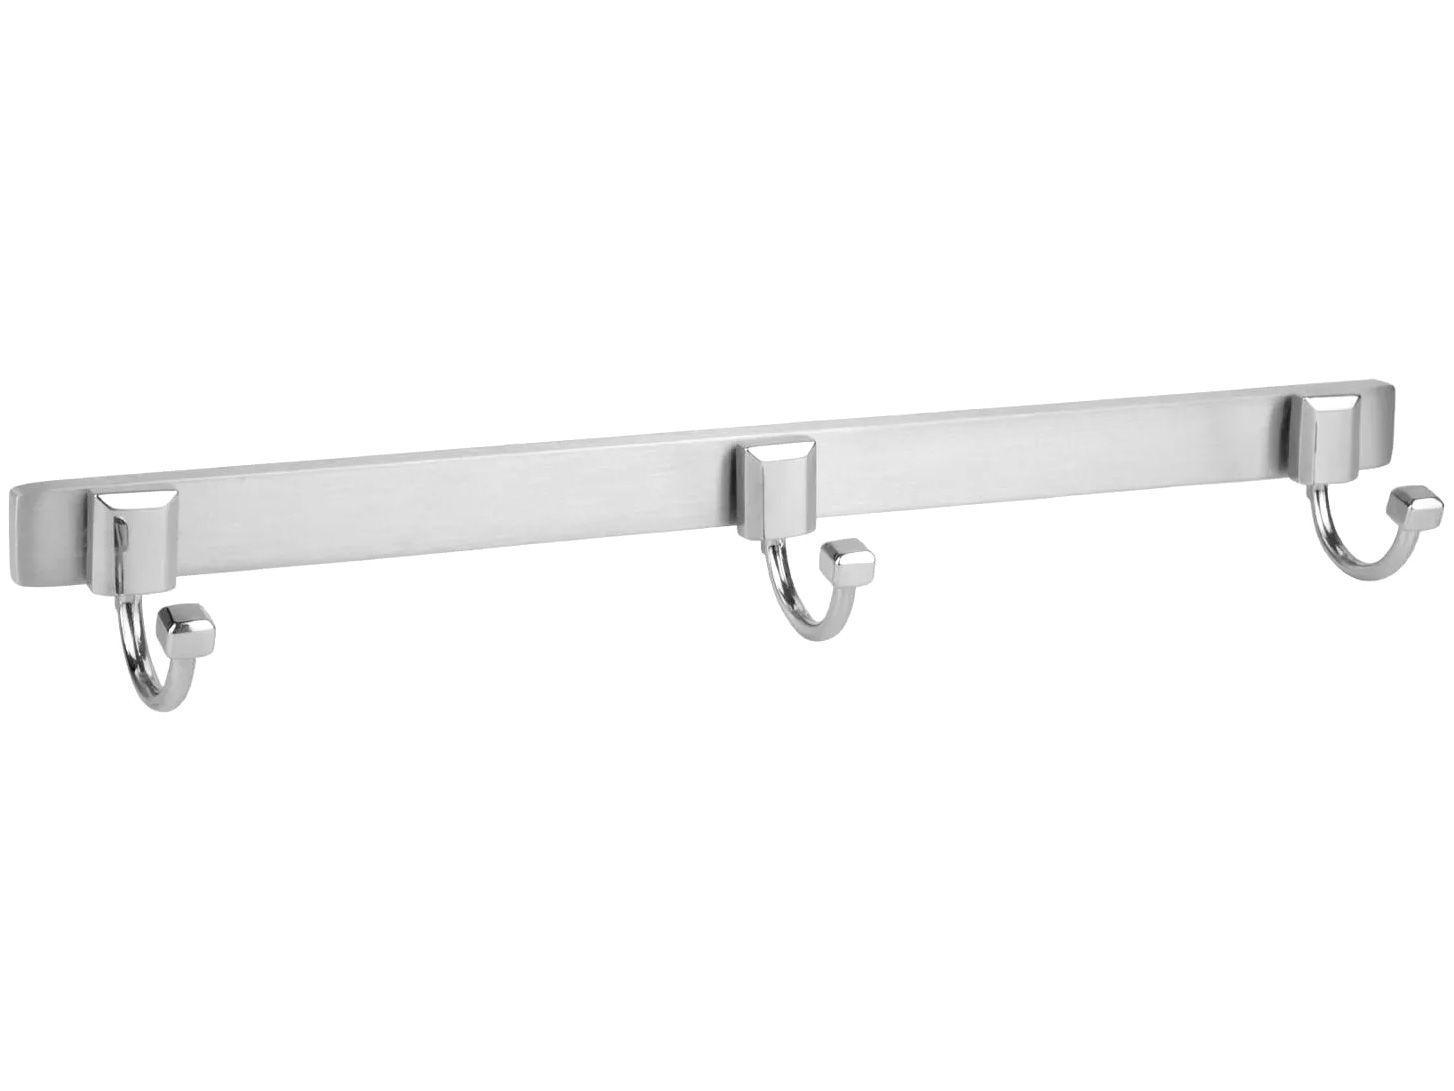 Cabide Triplo para Banheiro Cromado Classic - CL3170 Ducon Metais